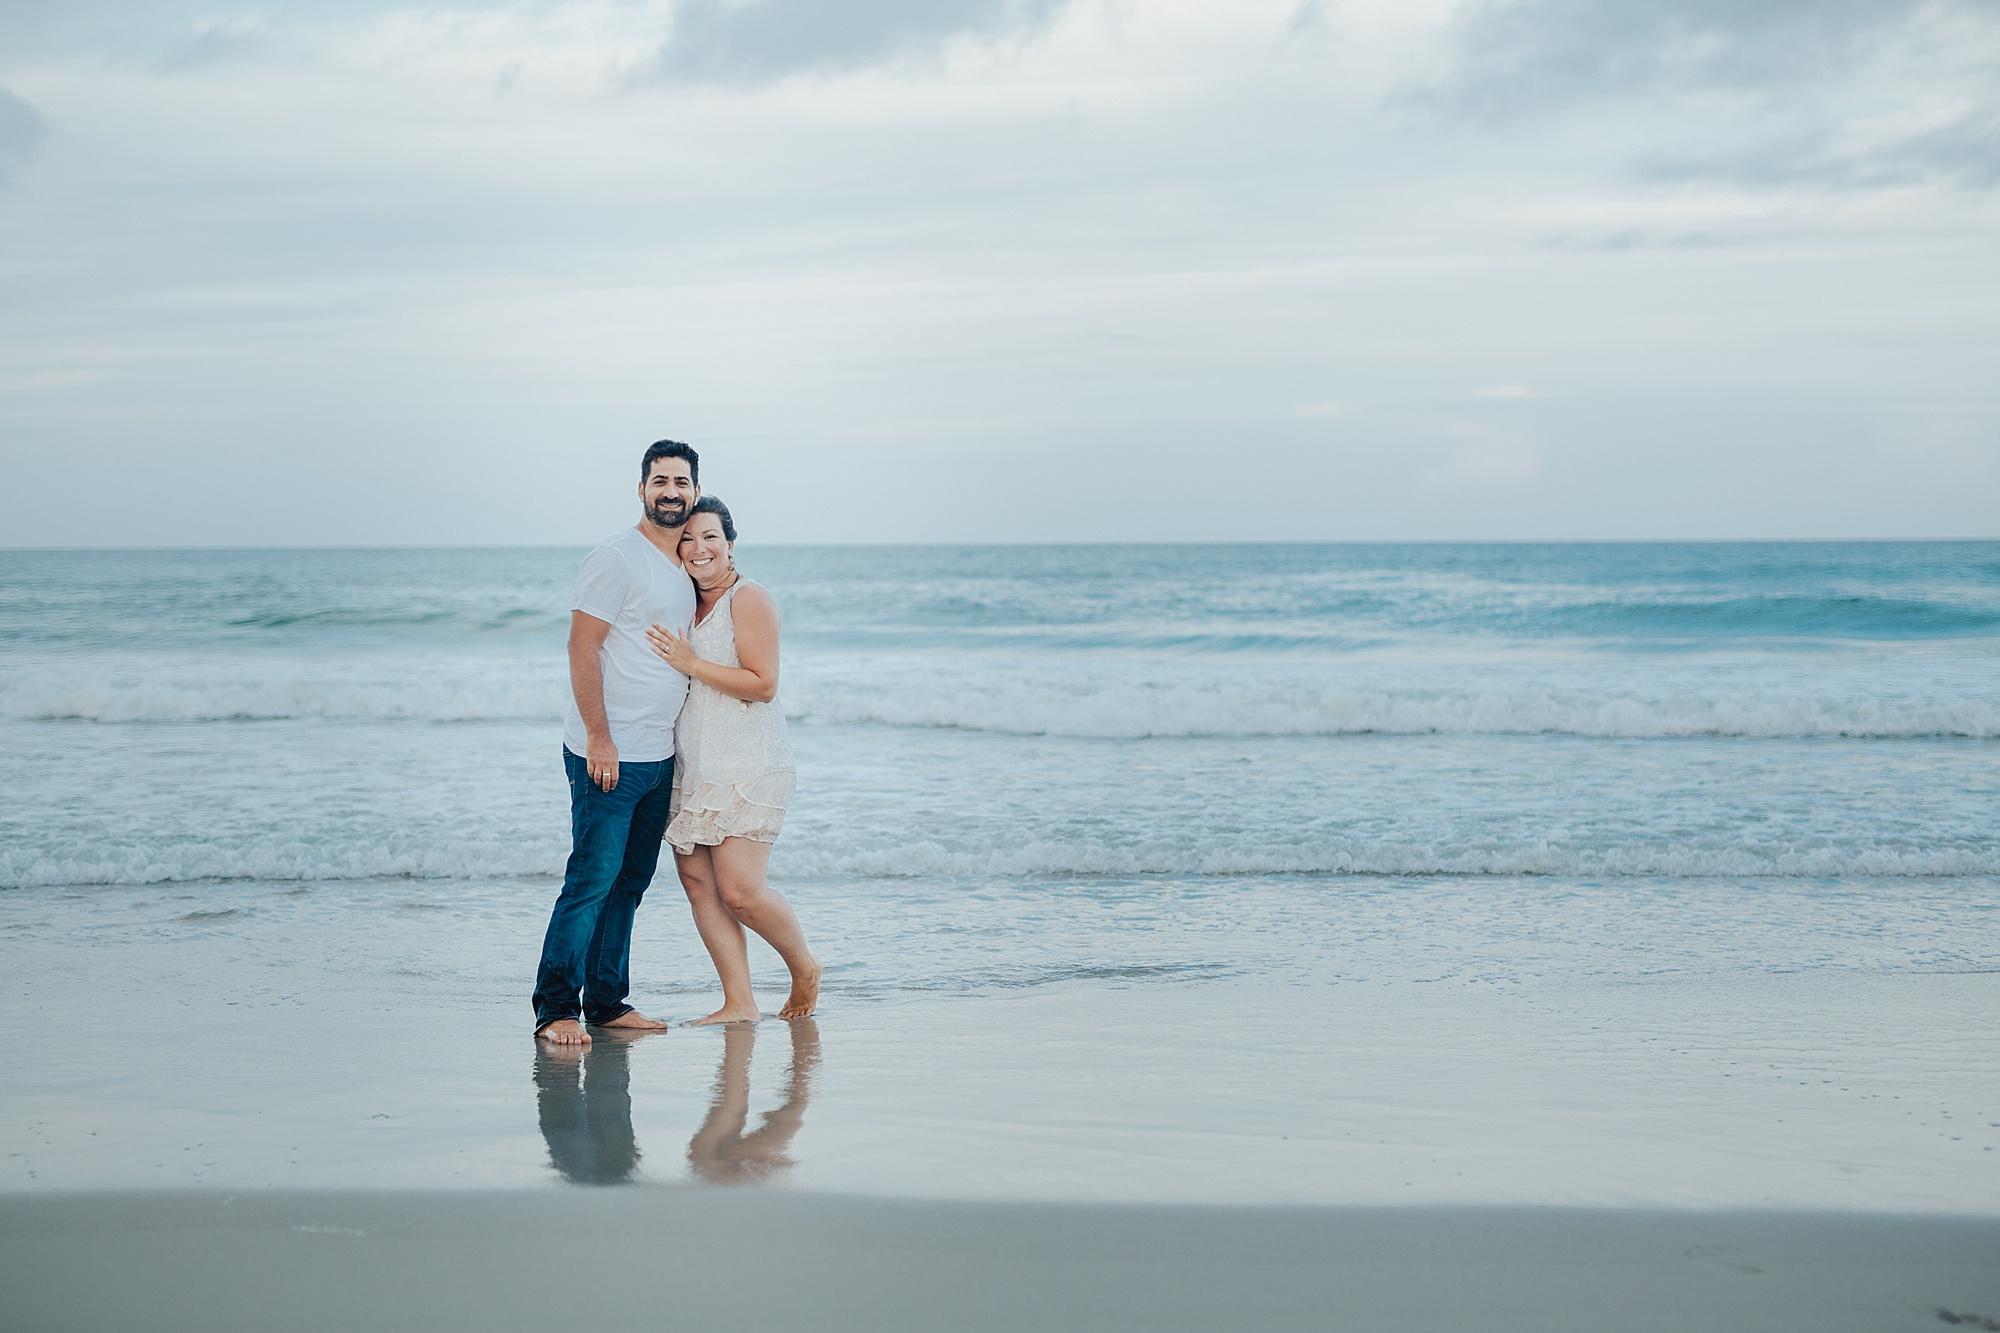 Joe_Mac_Creative_Beach_Family_Photography_OBX_Corolla__0044.jpg